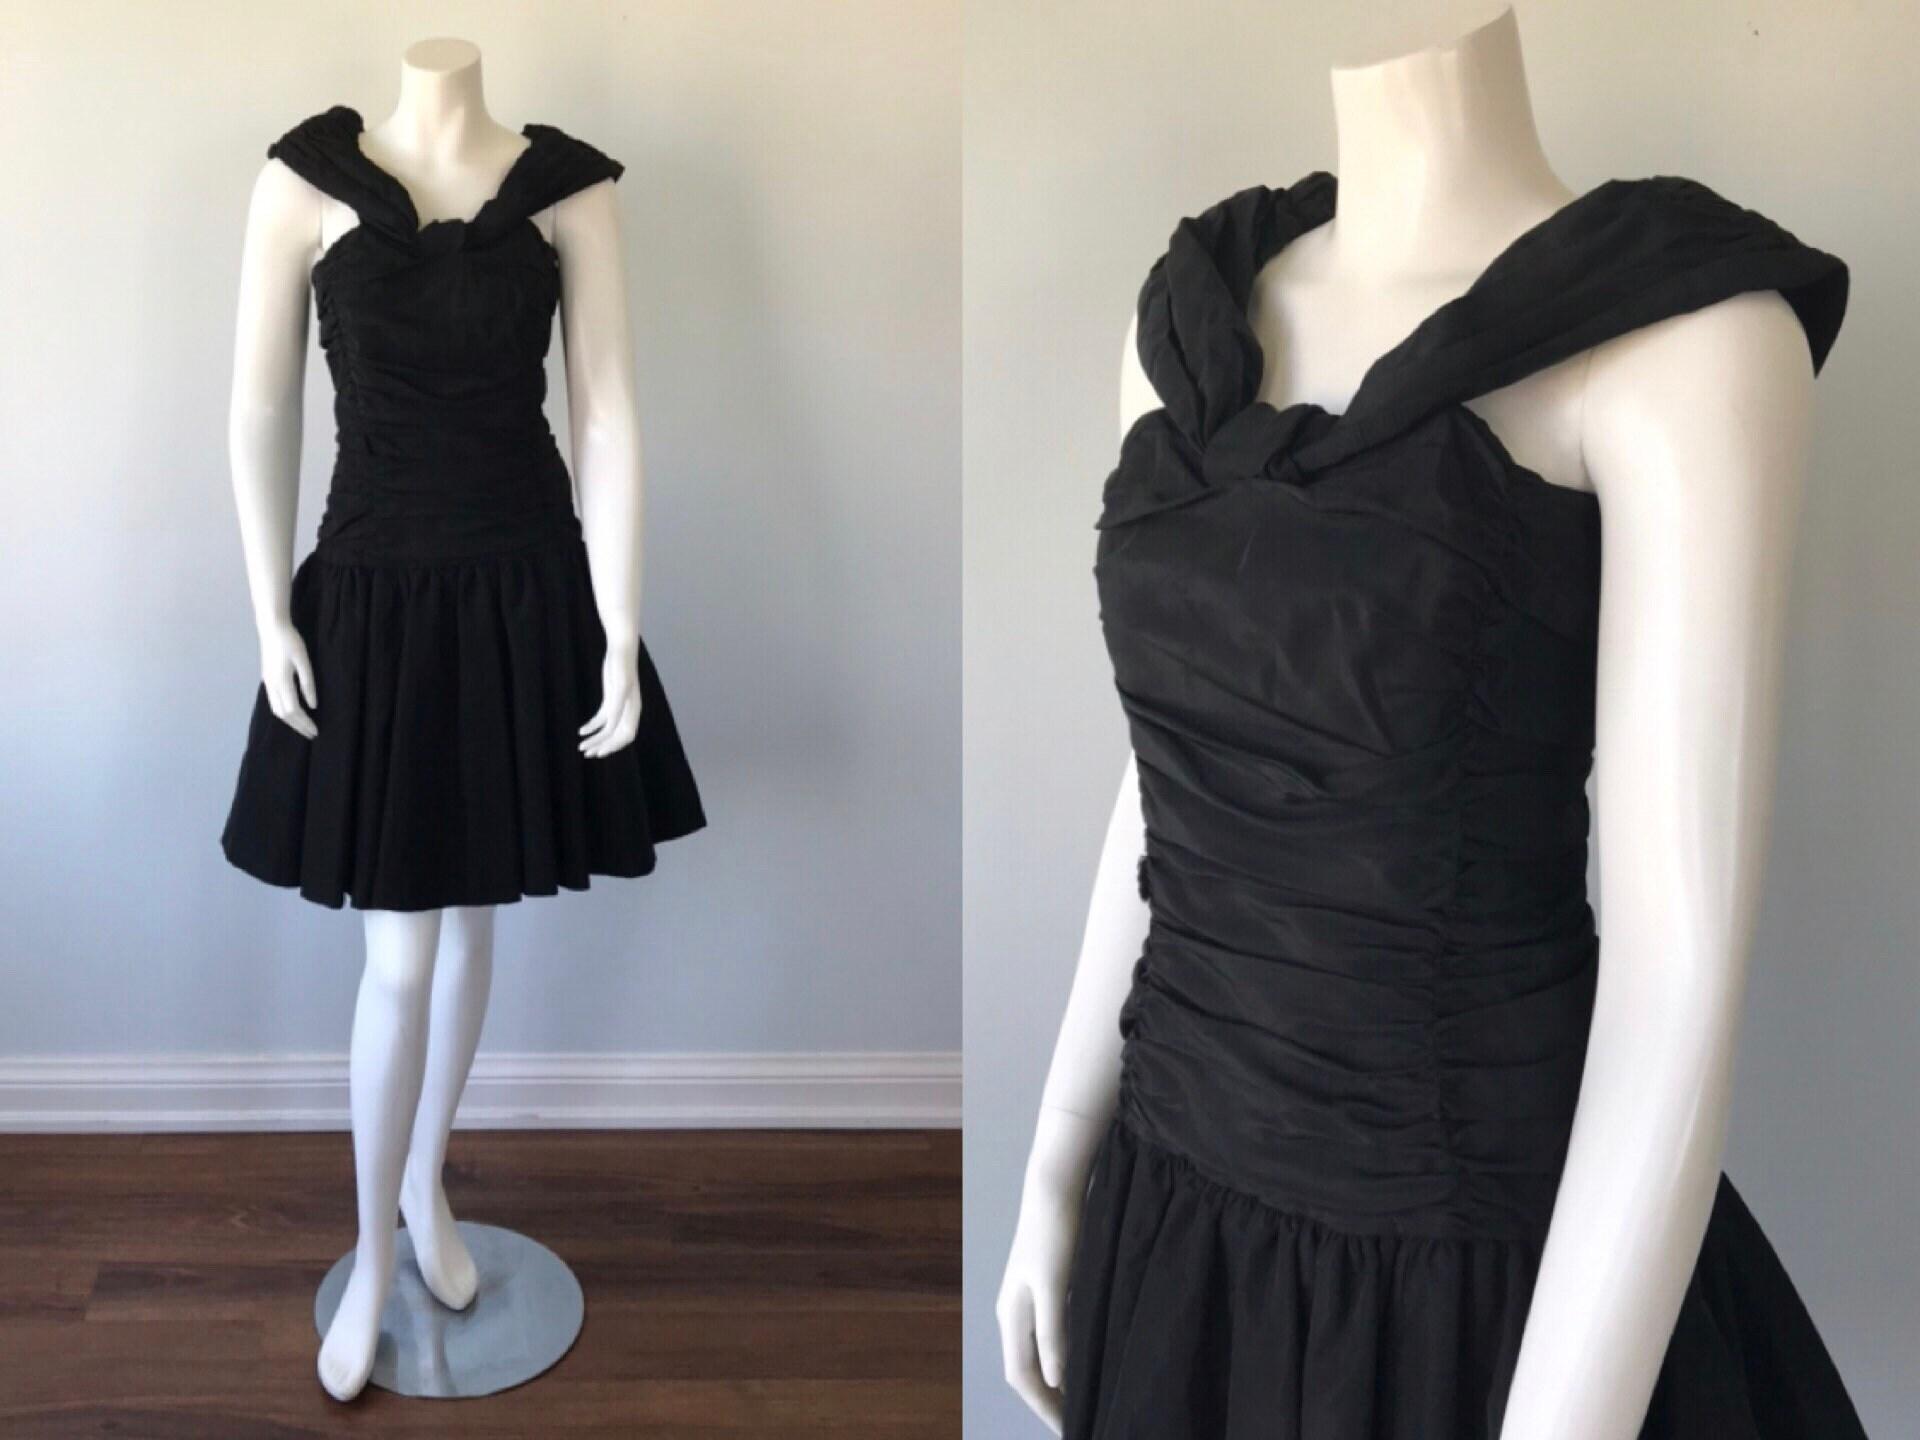 80s Dresses | Casual to Party Dresses Vintage 1980S Laura Ashley Black Cocktail Dress. Dress, Ashley, Wedding, Dress $54.60 AT vintagedancer.com